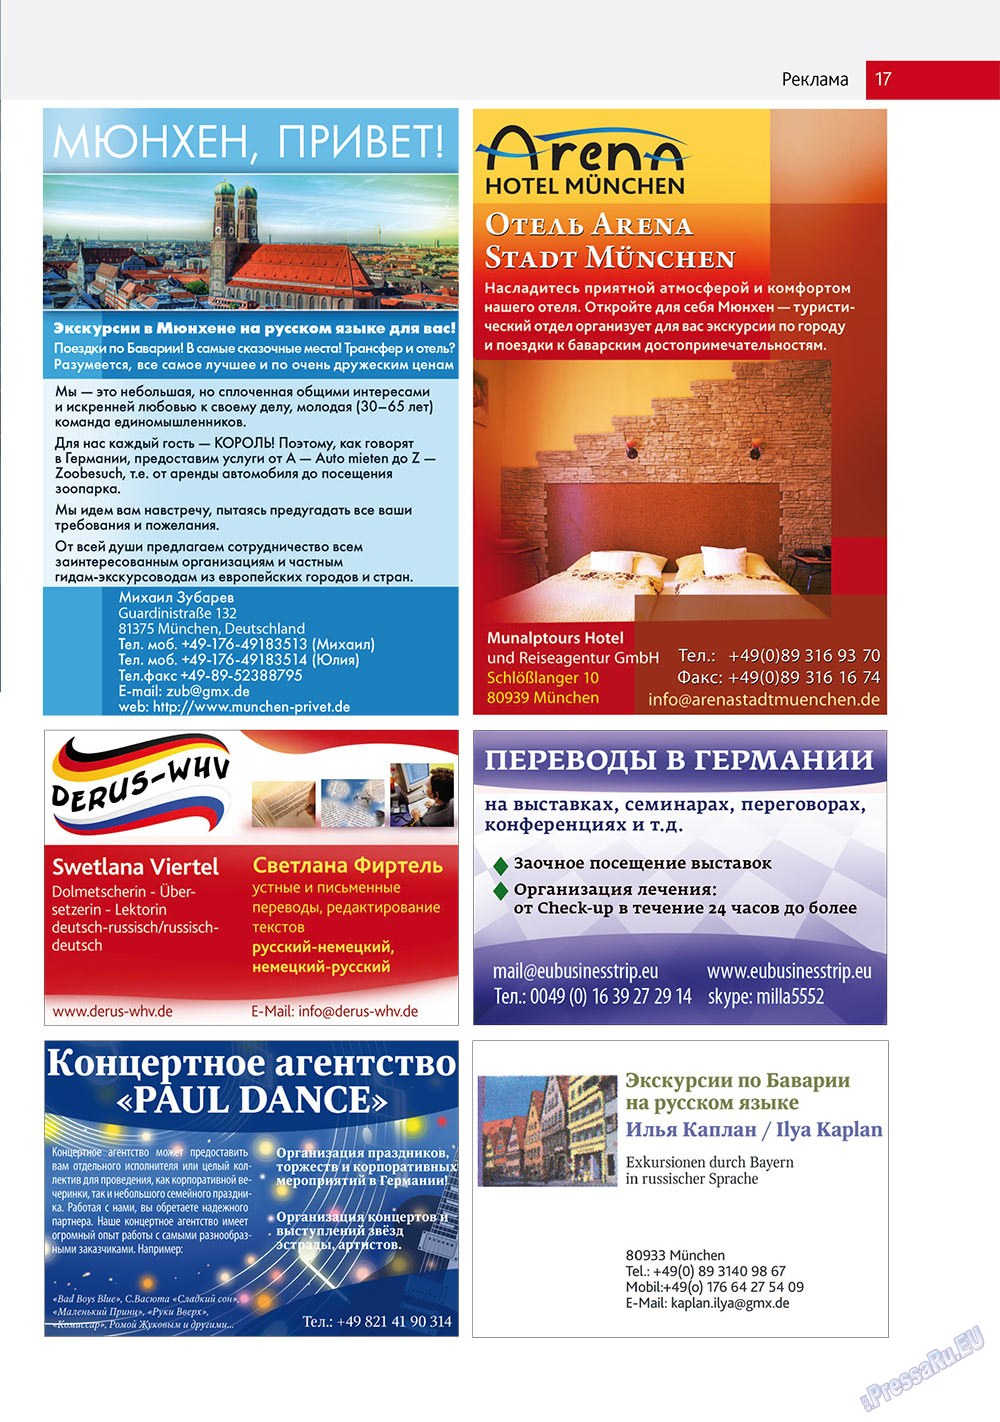 Бизнес парк (журнал). 2011 год, номер 5, стр. 17